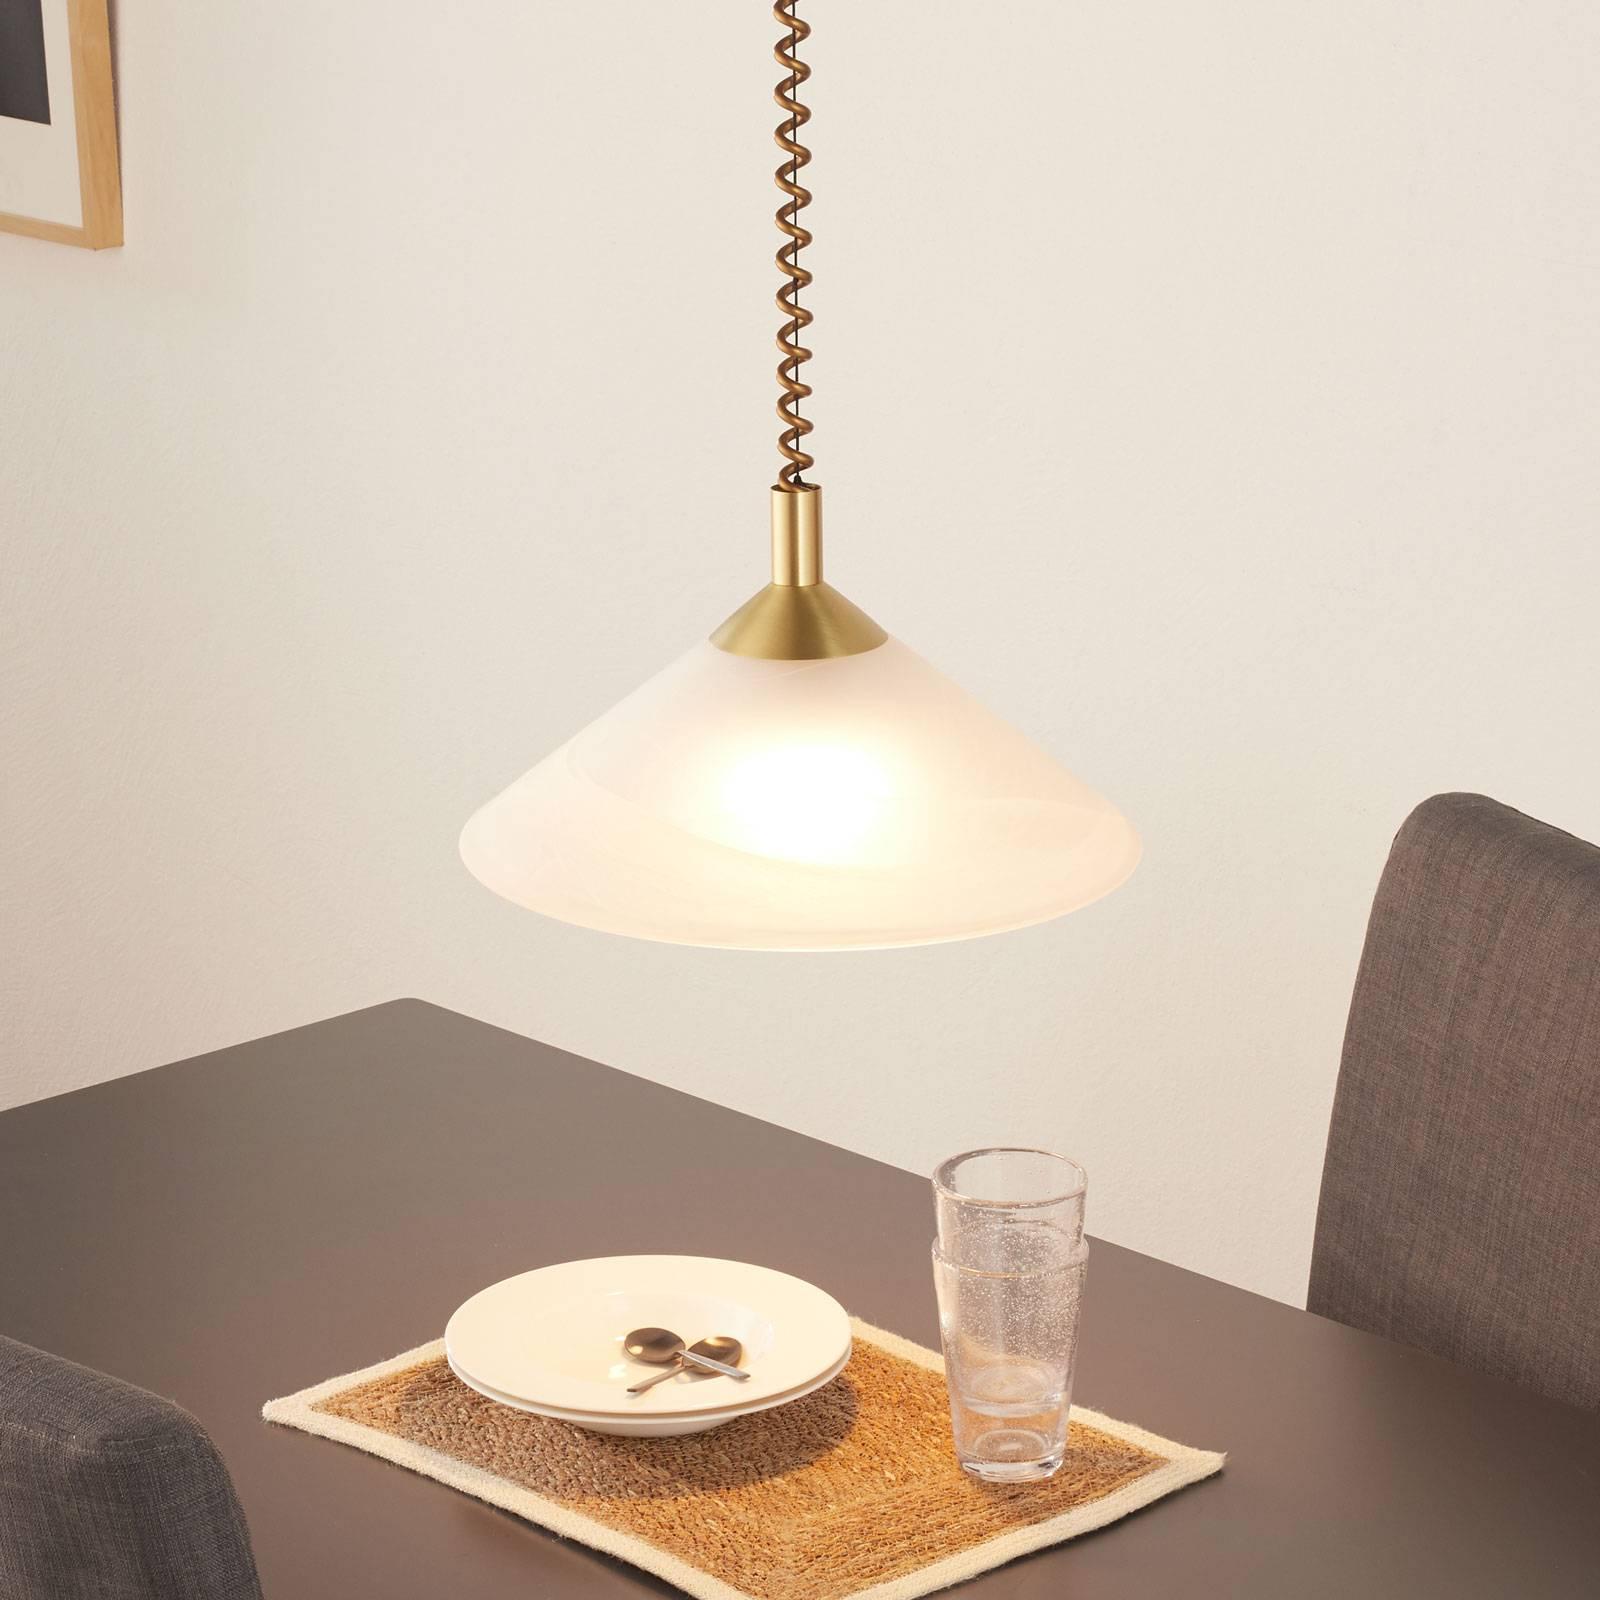 Saturn instelbare hanglamp in messinglook